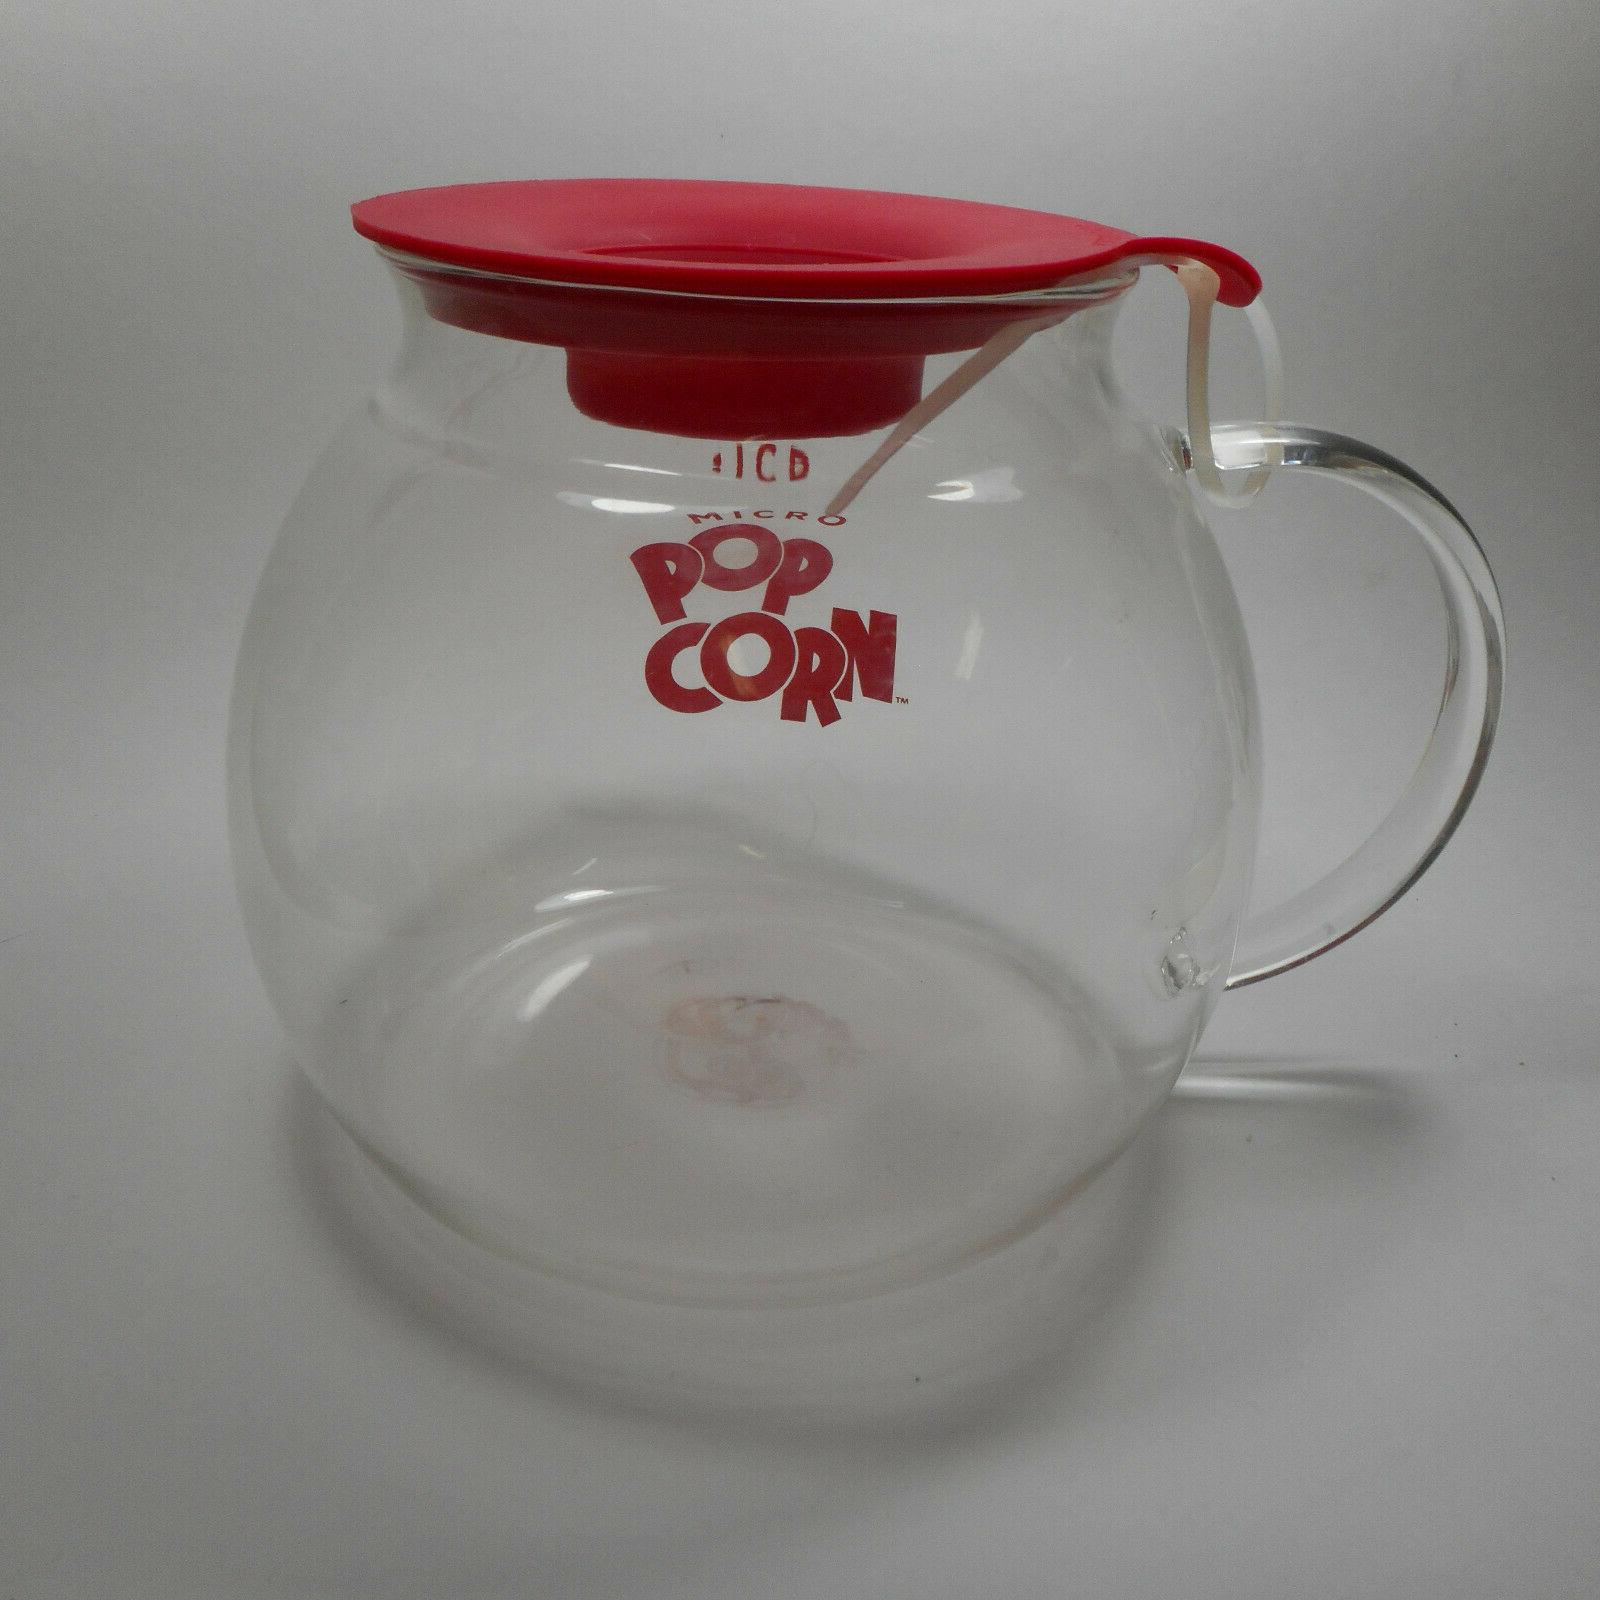 Ecolution 3 Capacity Microwave Popcorn